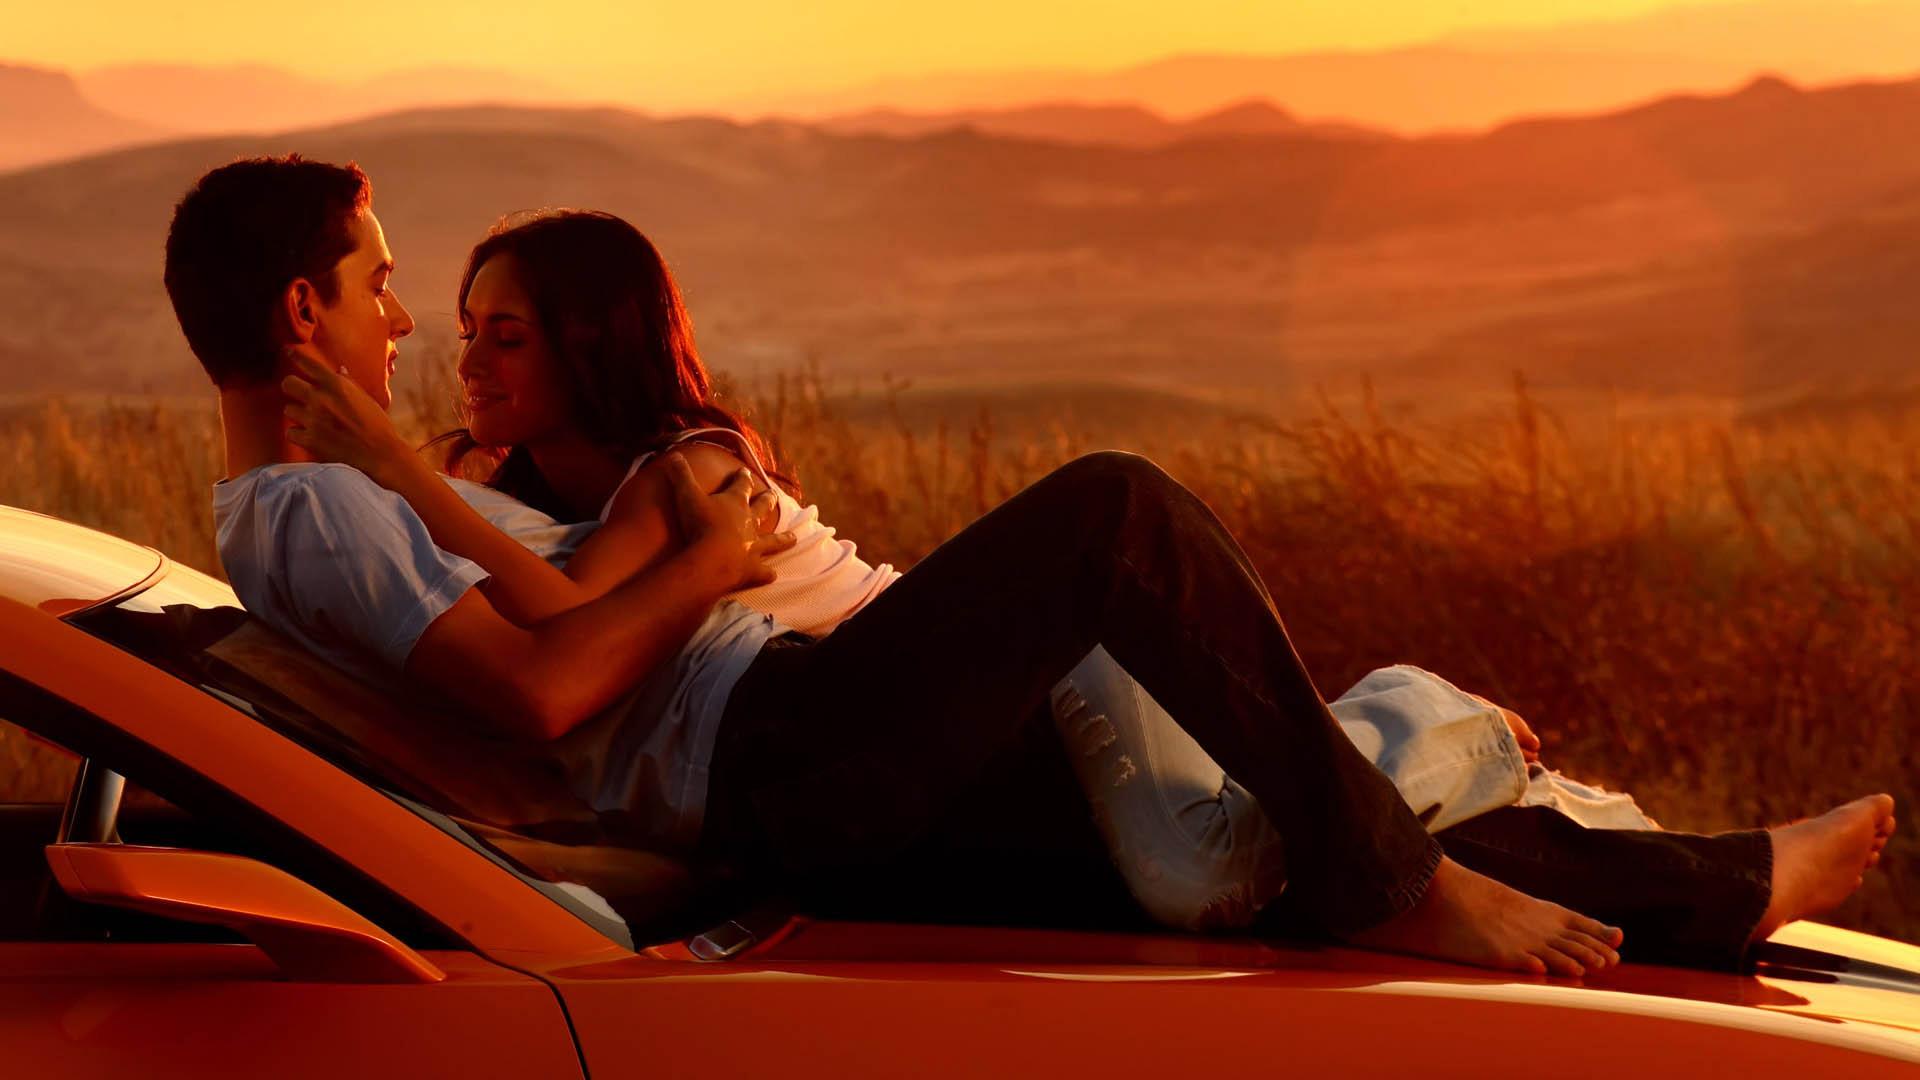 couple-romance-in-car